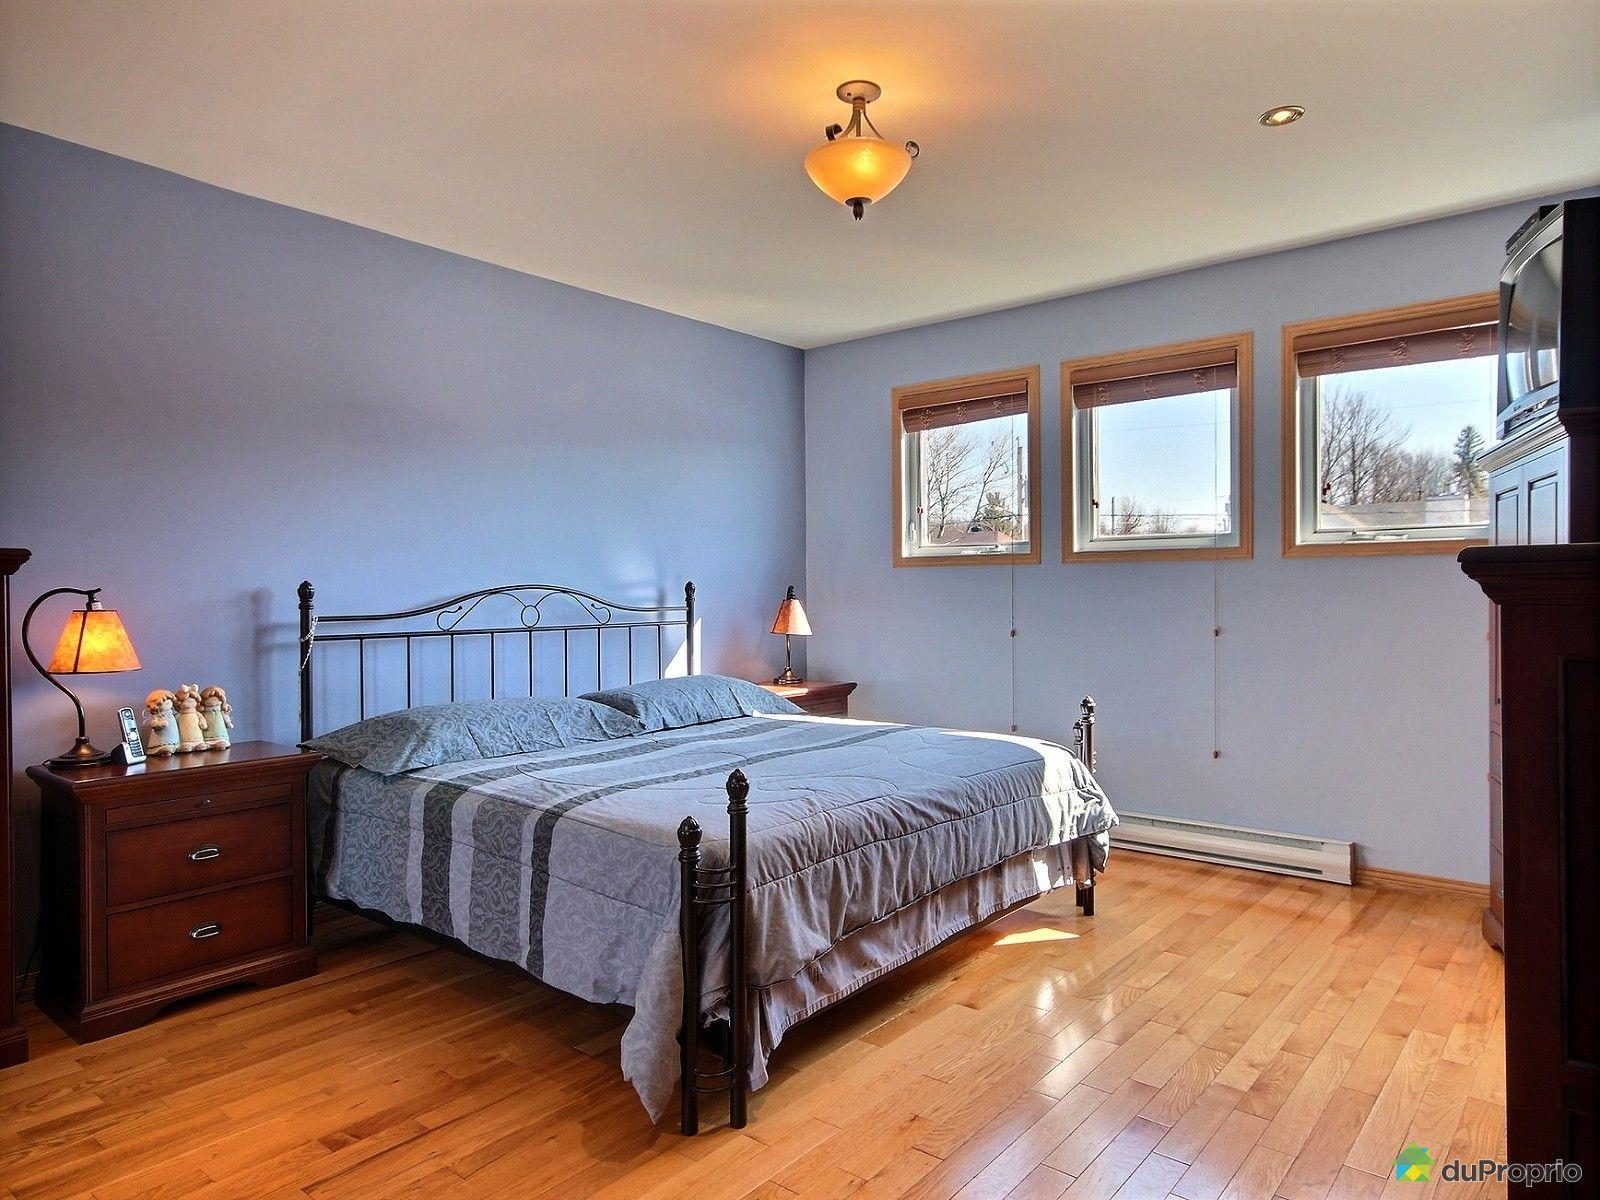 Maison vendre magog 441 rue gosselin immobilier qu bec for Chambre de commerce de magog